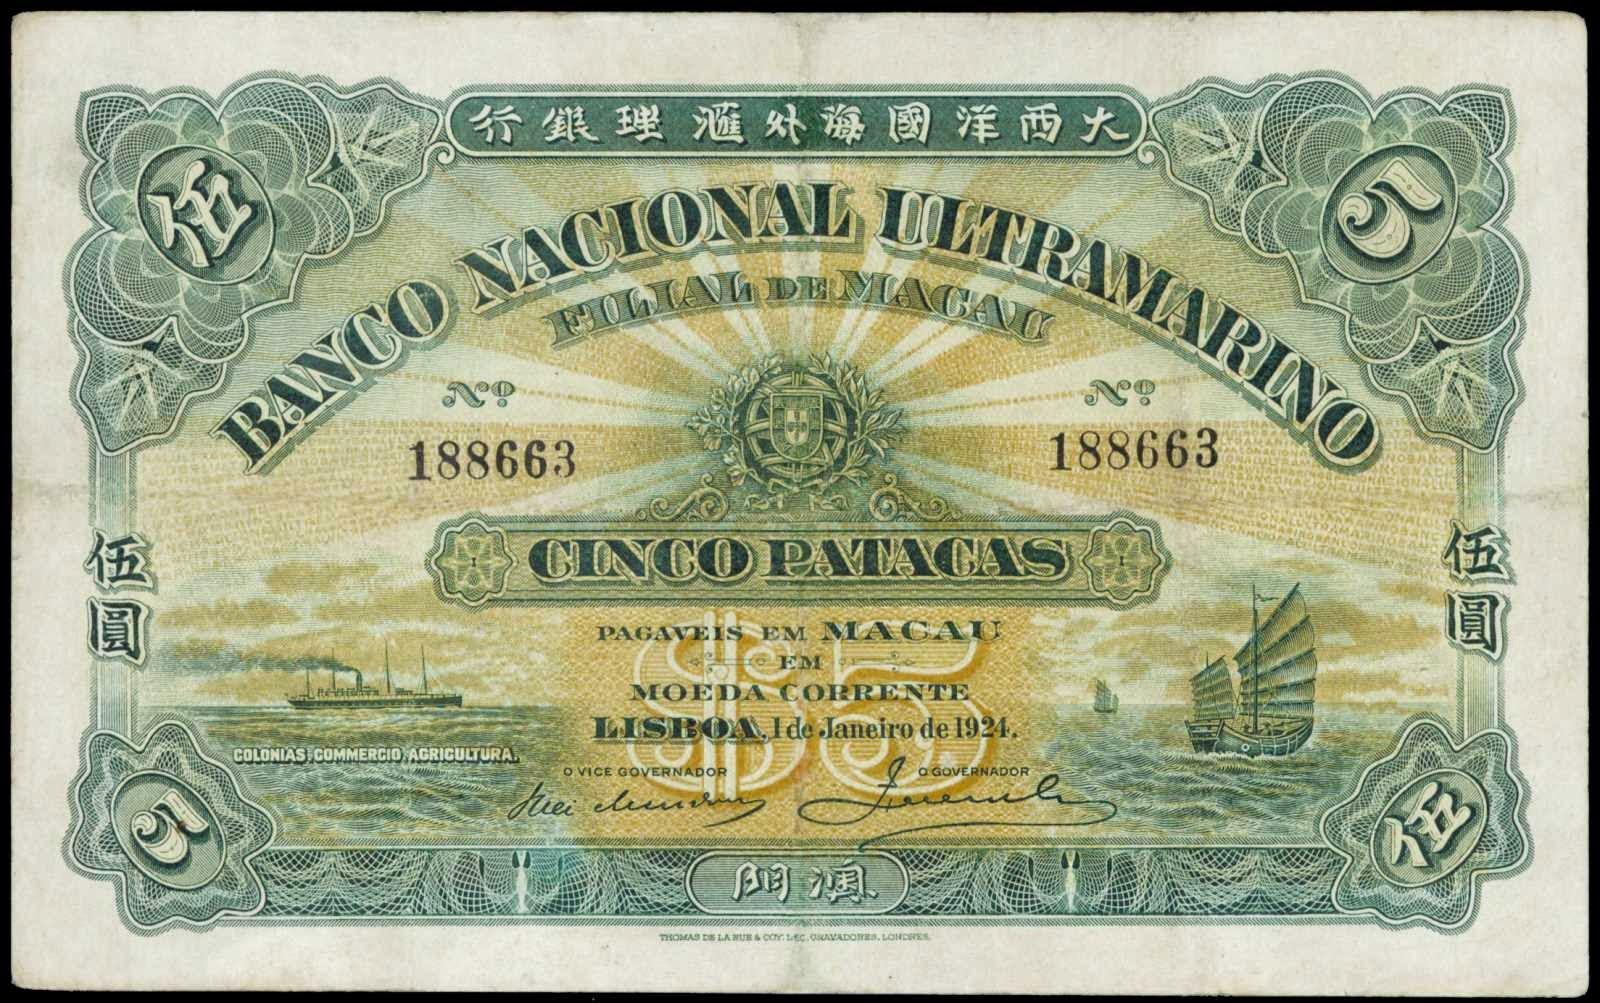 Macau Banknotes 5 Patacas 1924 Banco Nacional Ultramarino